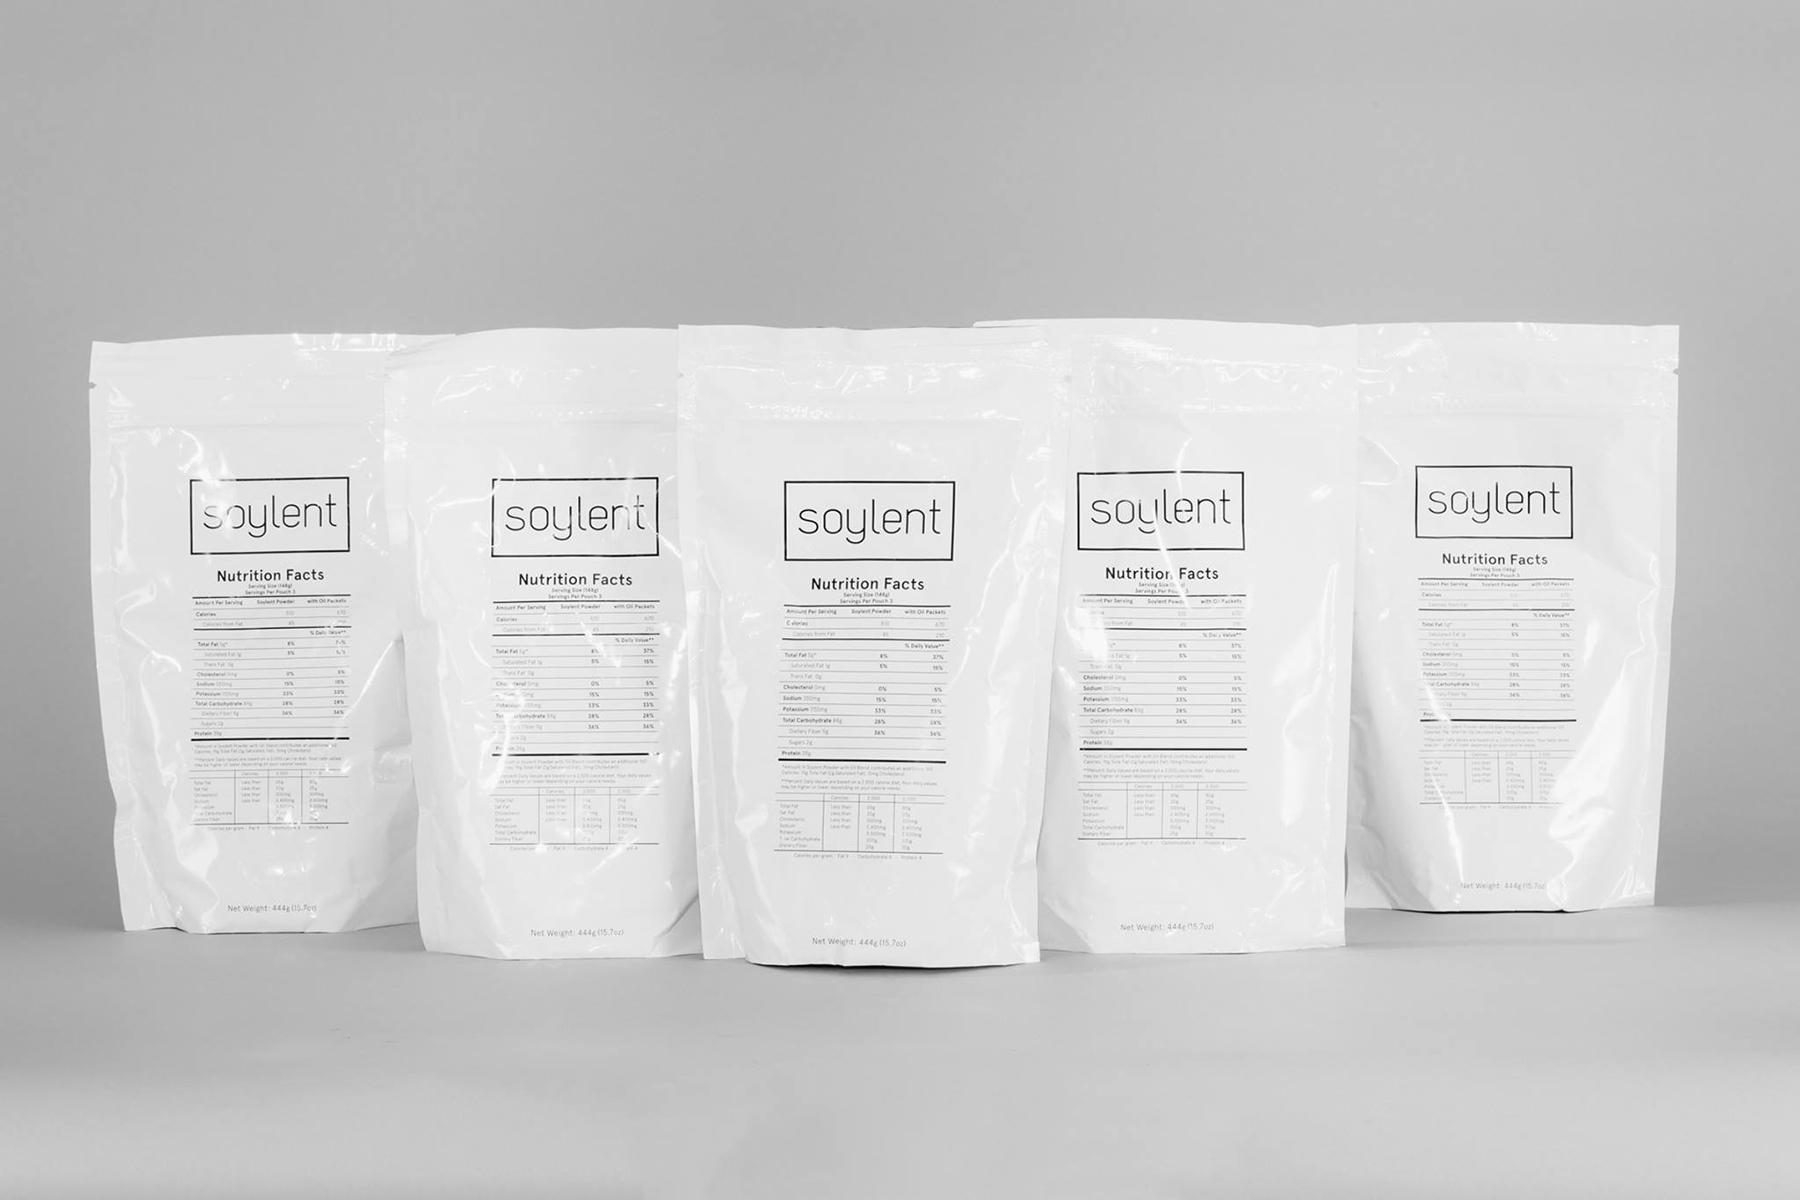 Soylent stops powder sales